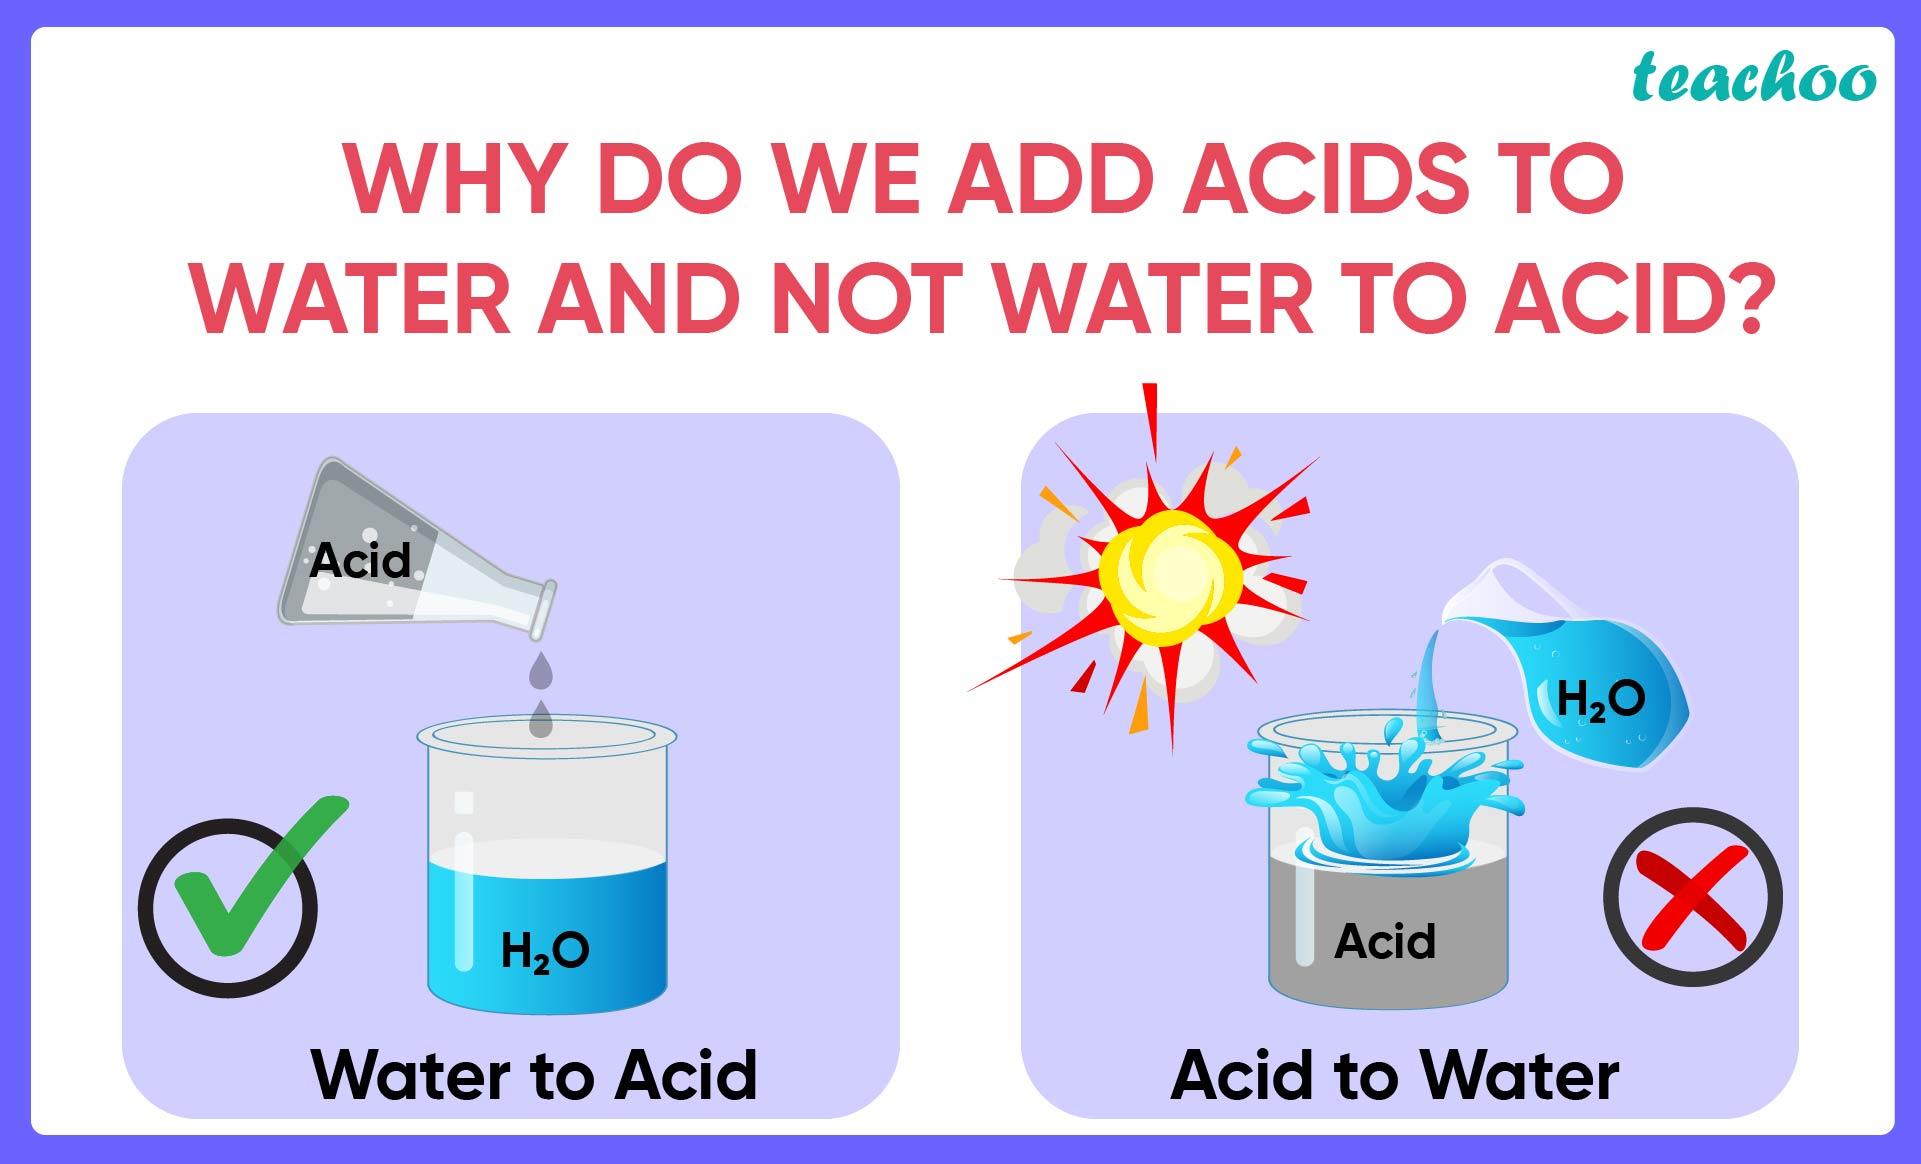 Add acids to water and not water to acid-Teachoo.jpg